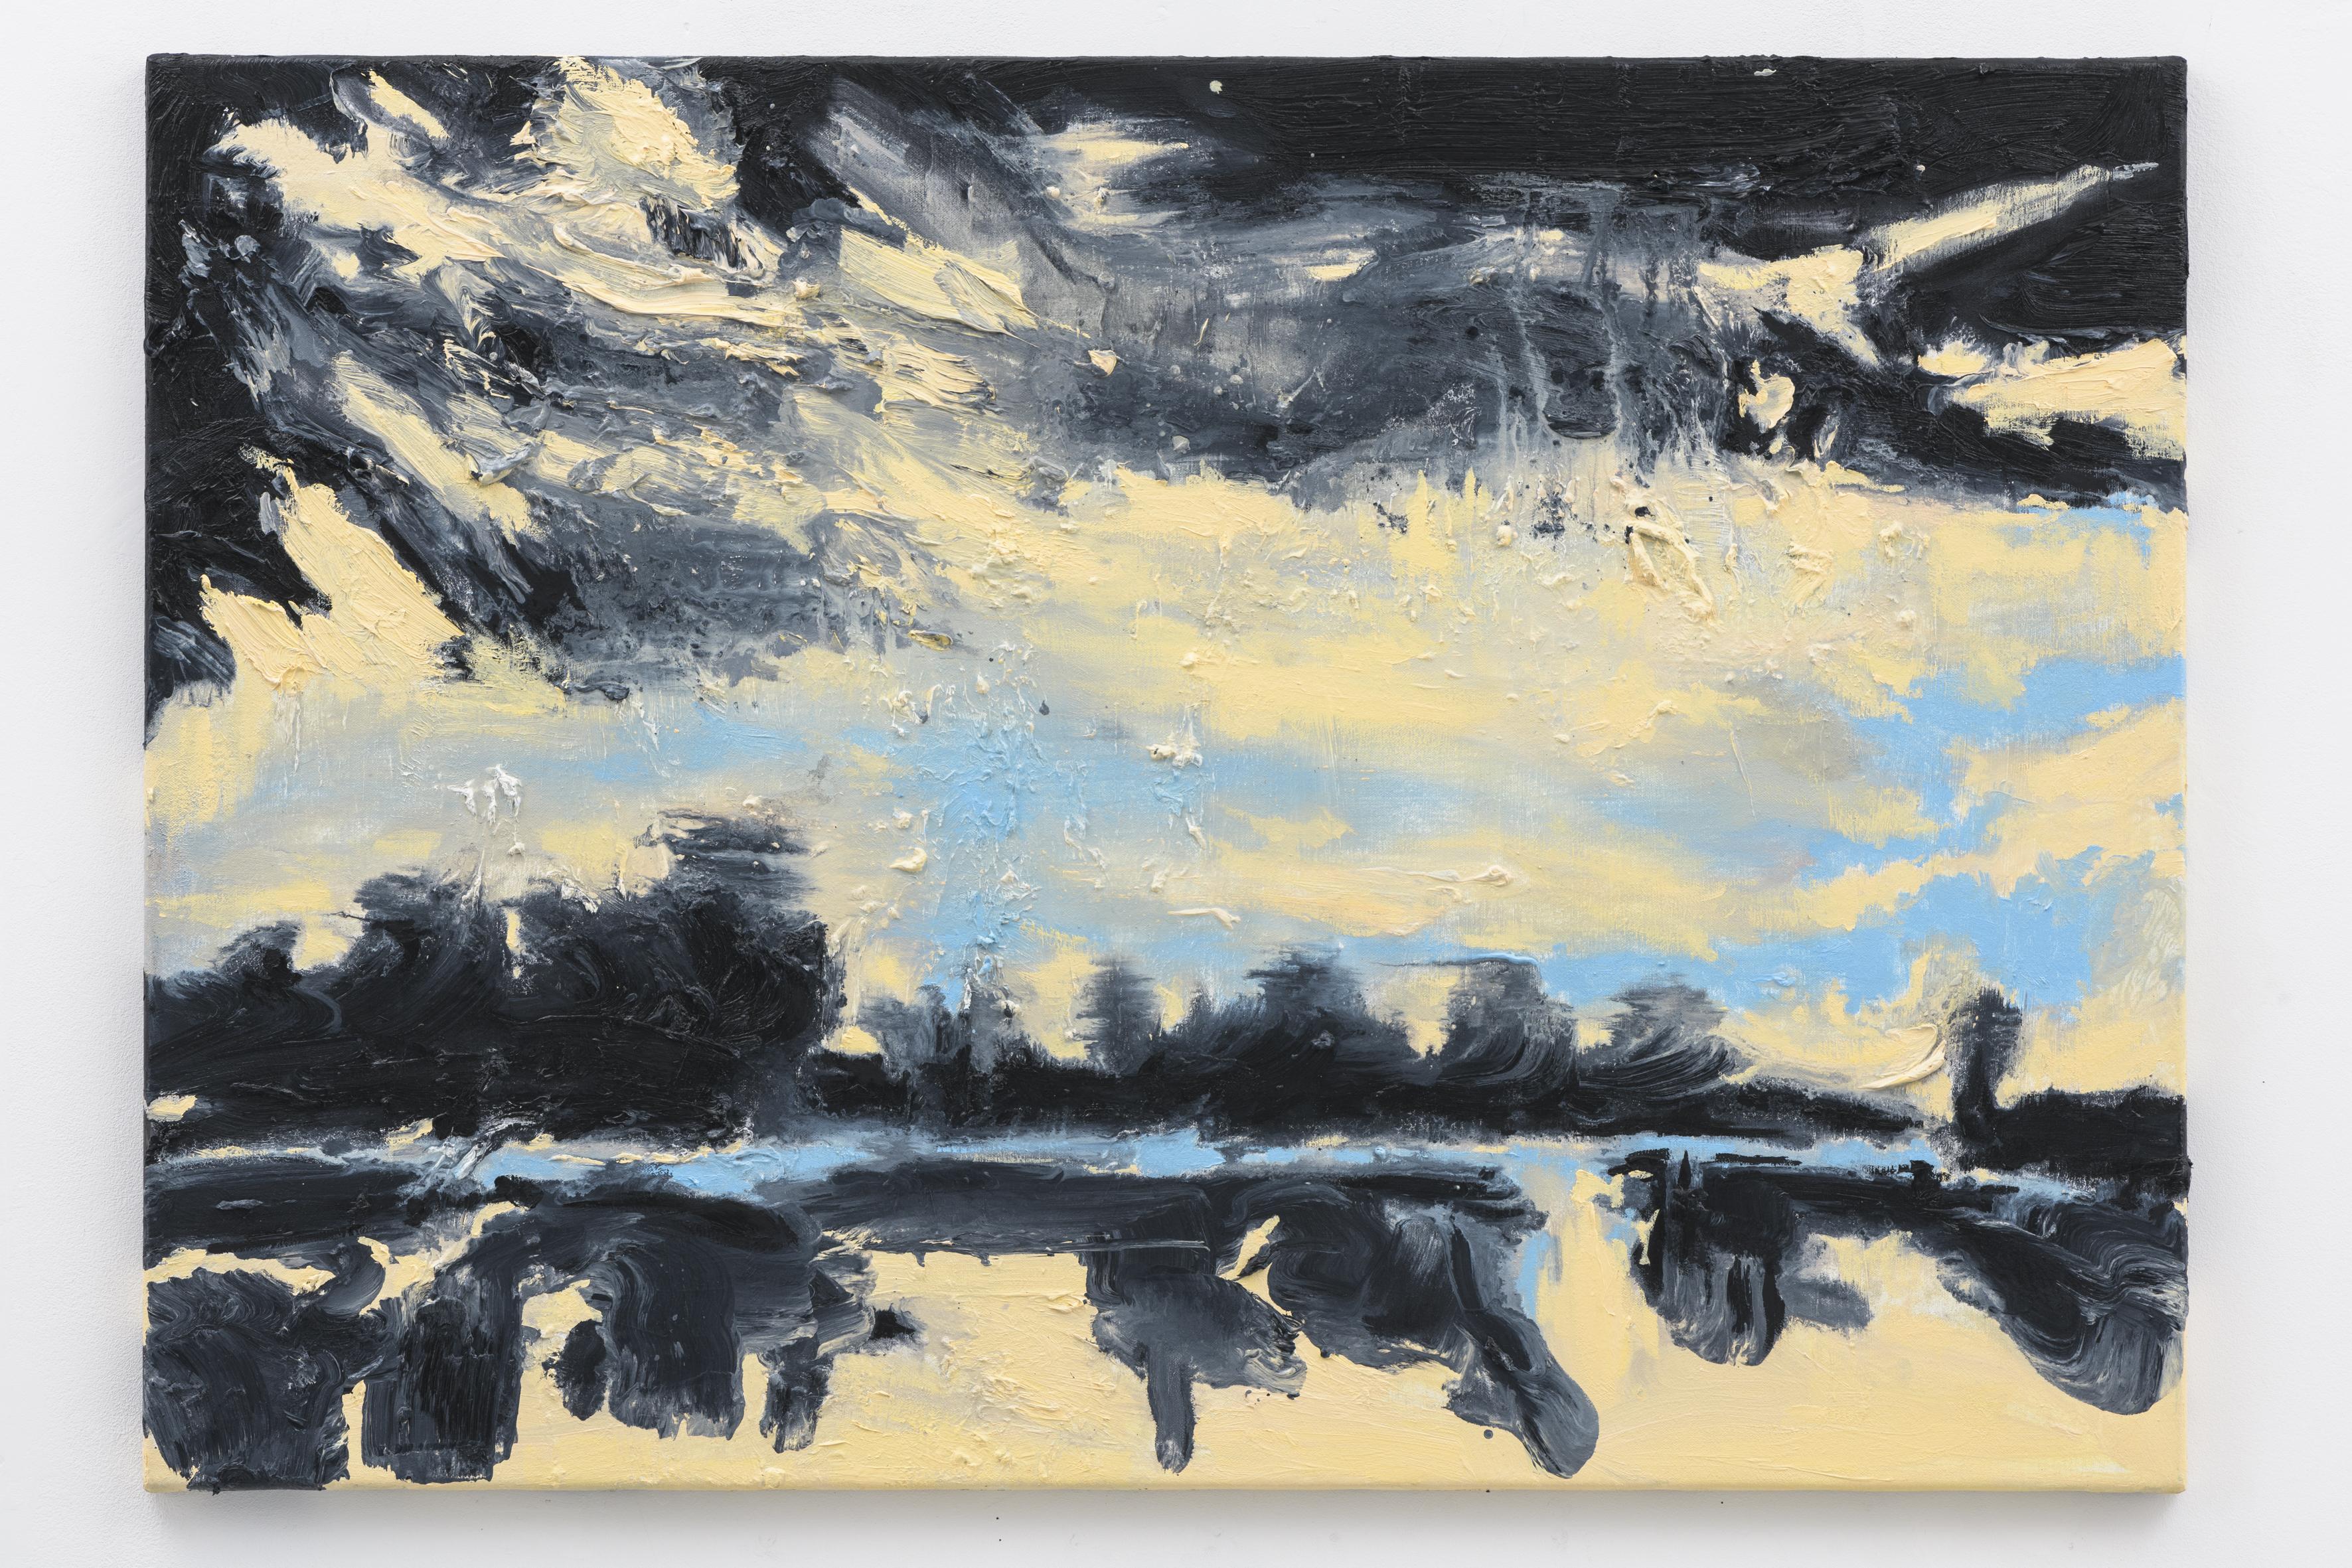 """Mirrored Waters IV"", 70 x 100 cm., oil on linen 2017 (Van Gogh)"